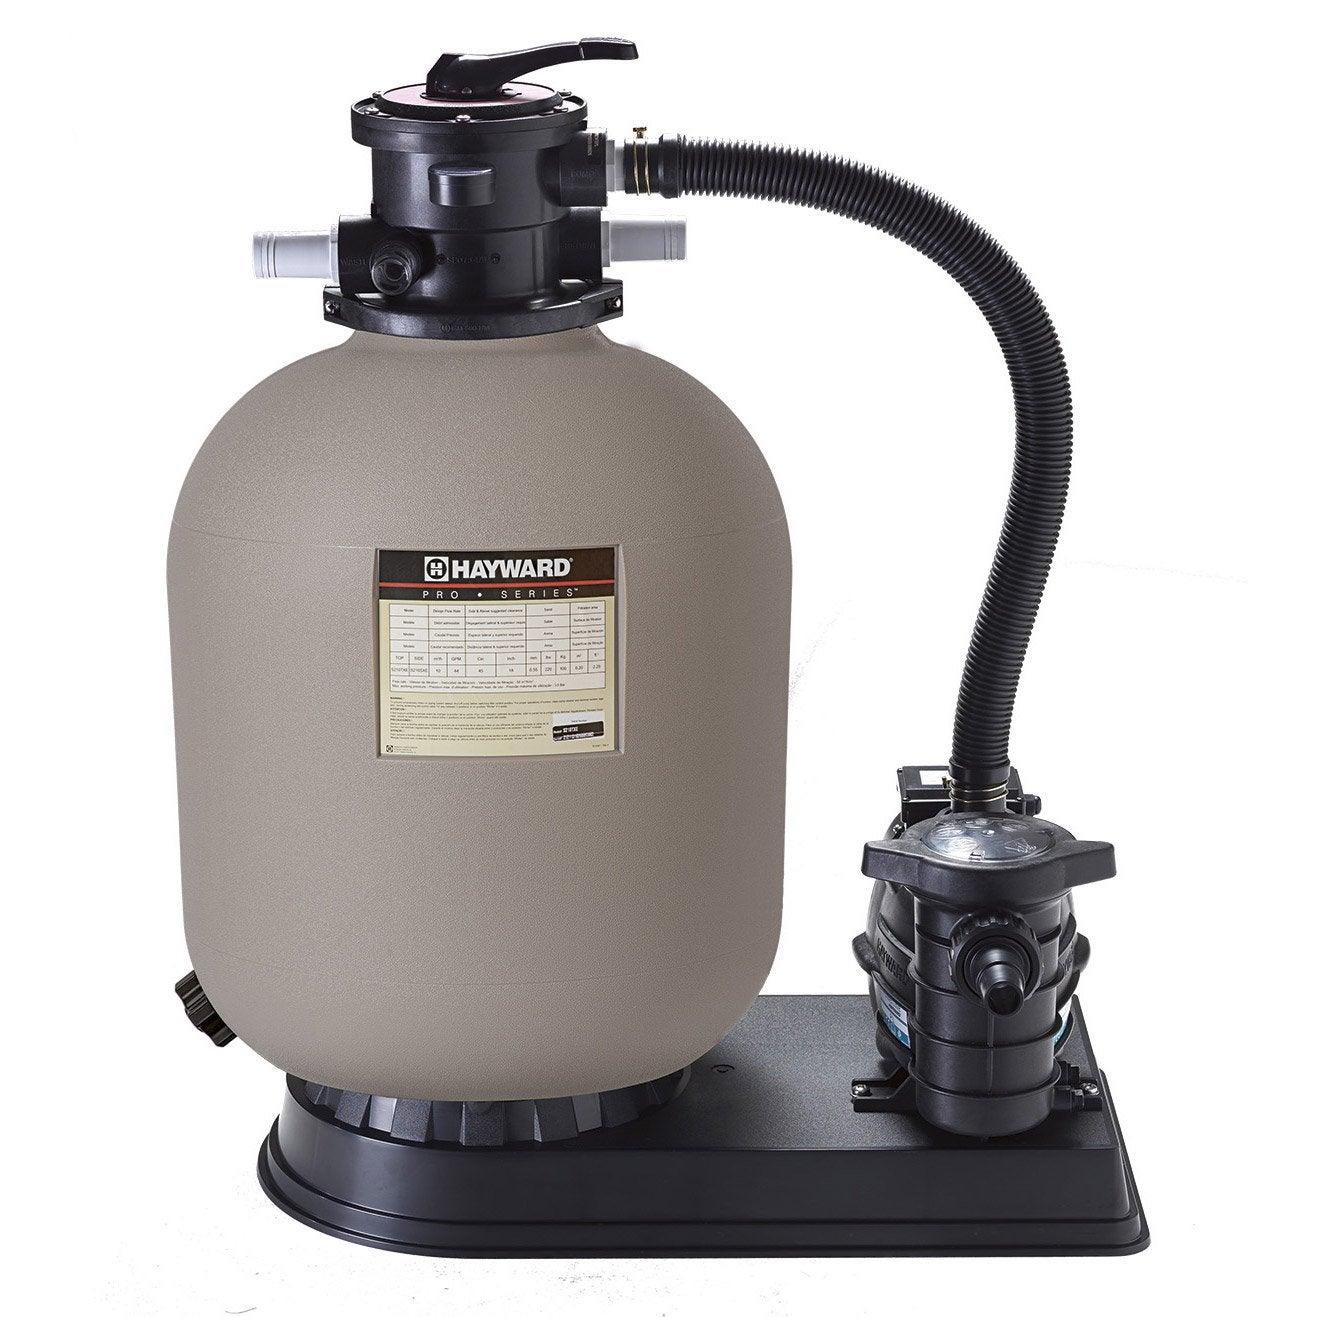 Kit de filtration sable hayward powerline 10 m3 10 m h for Sable filtration